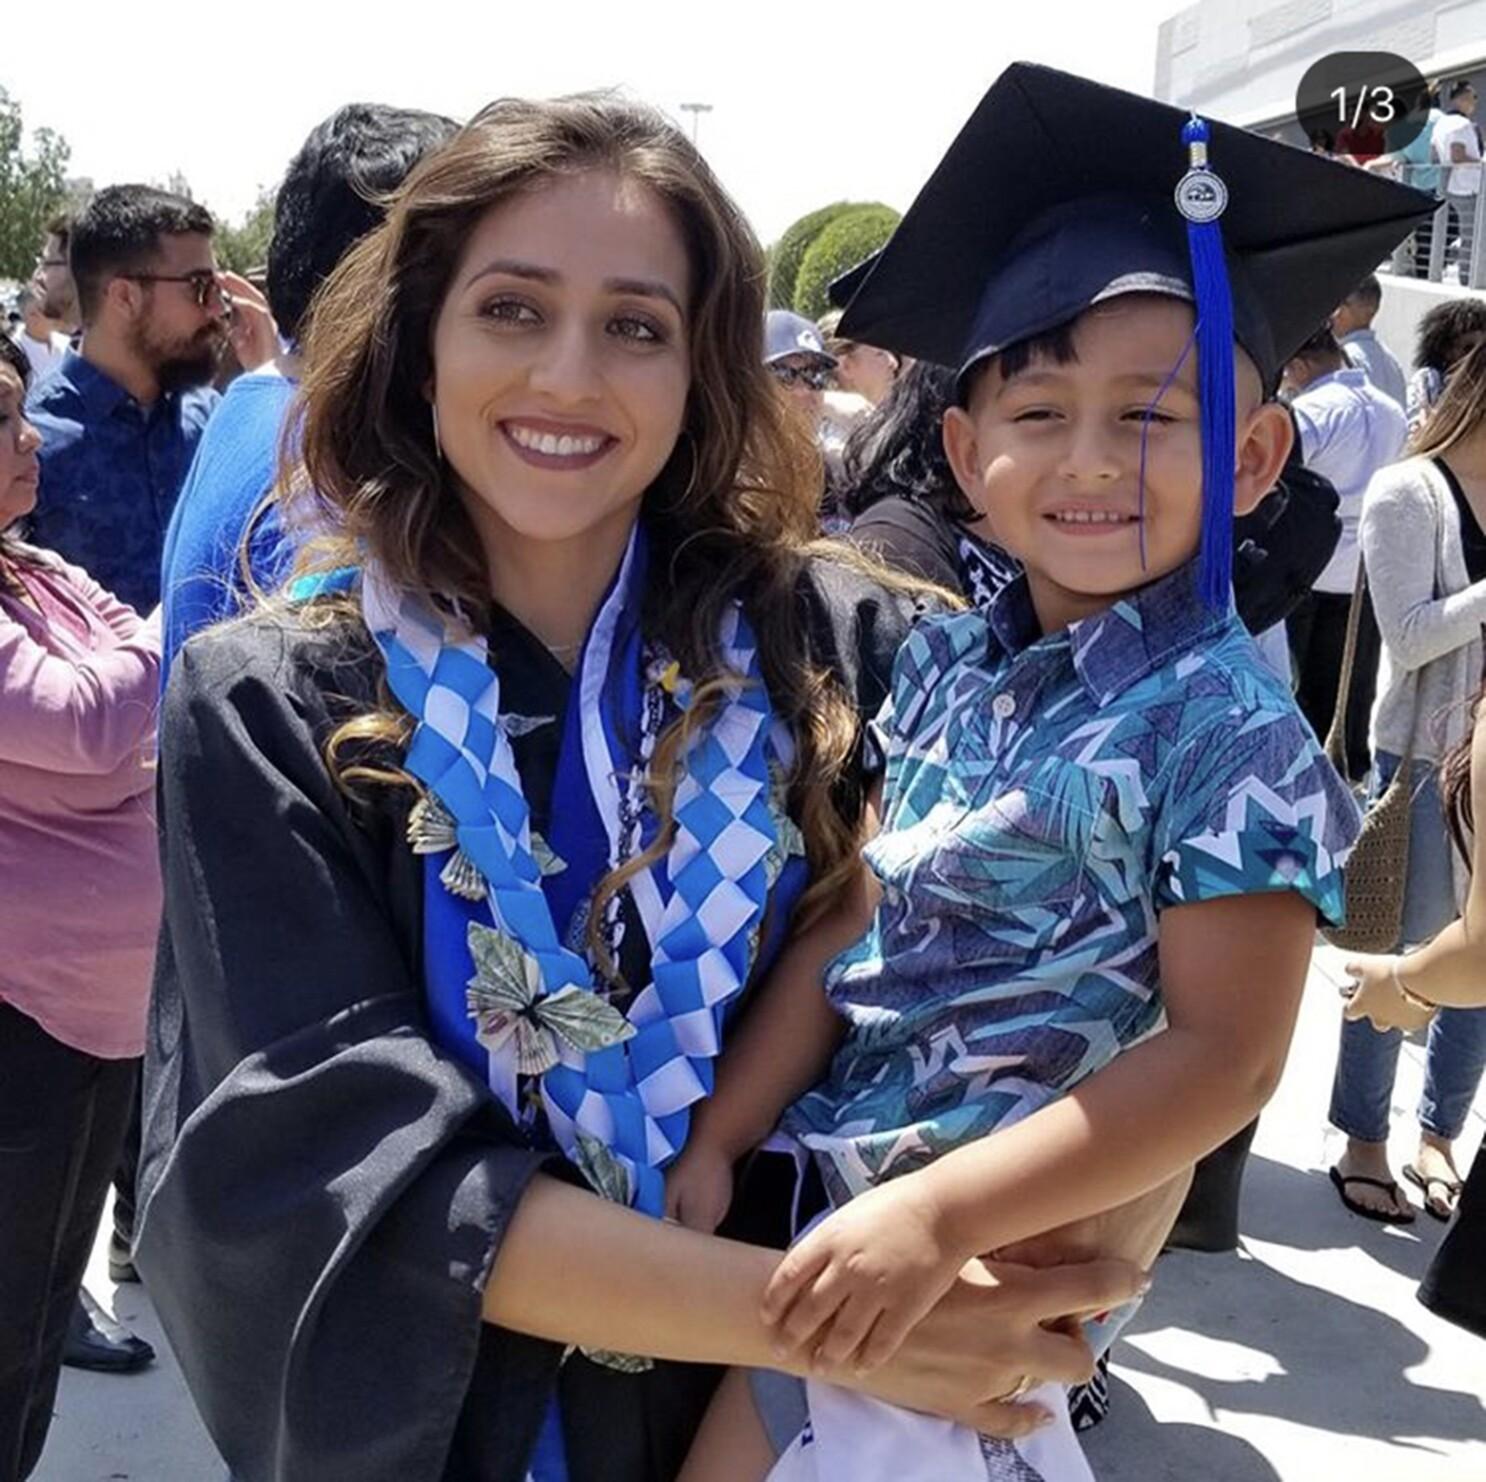 San Bernardino teacher is fatally shot at park; police seek gunman